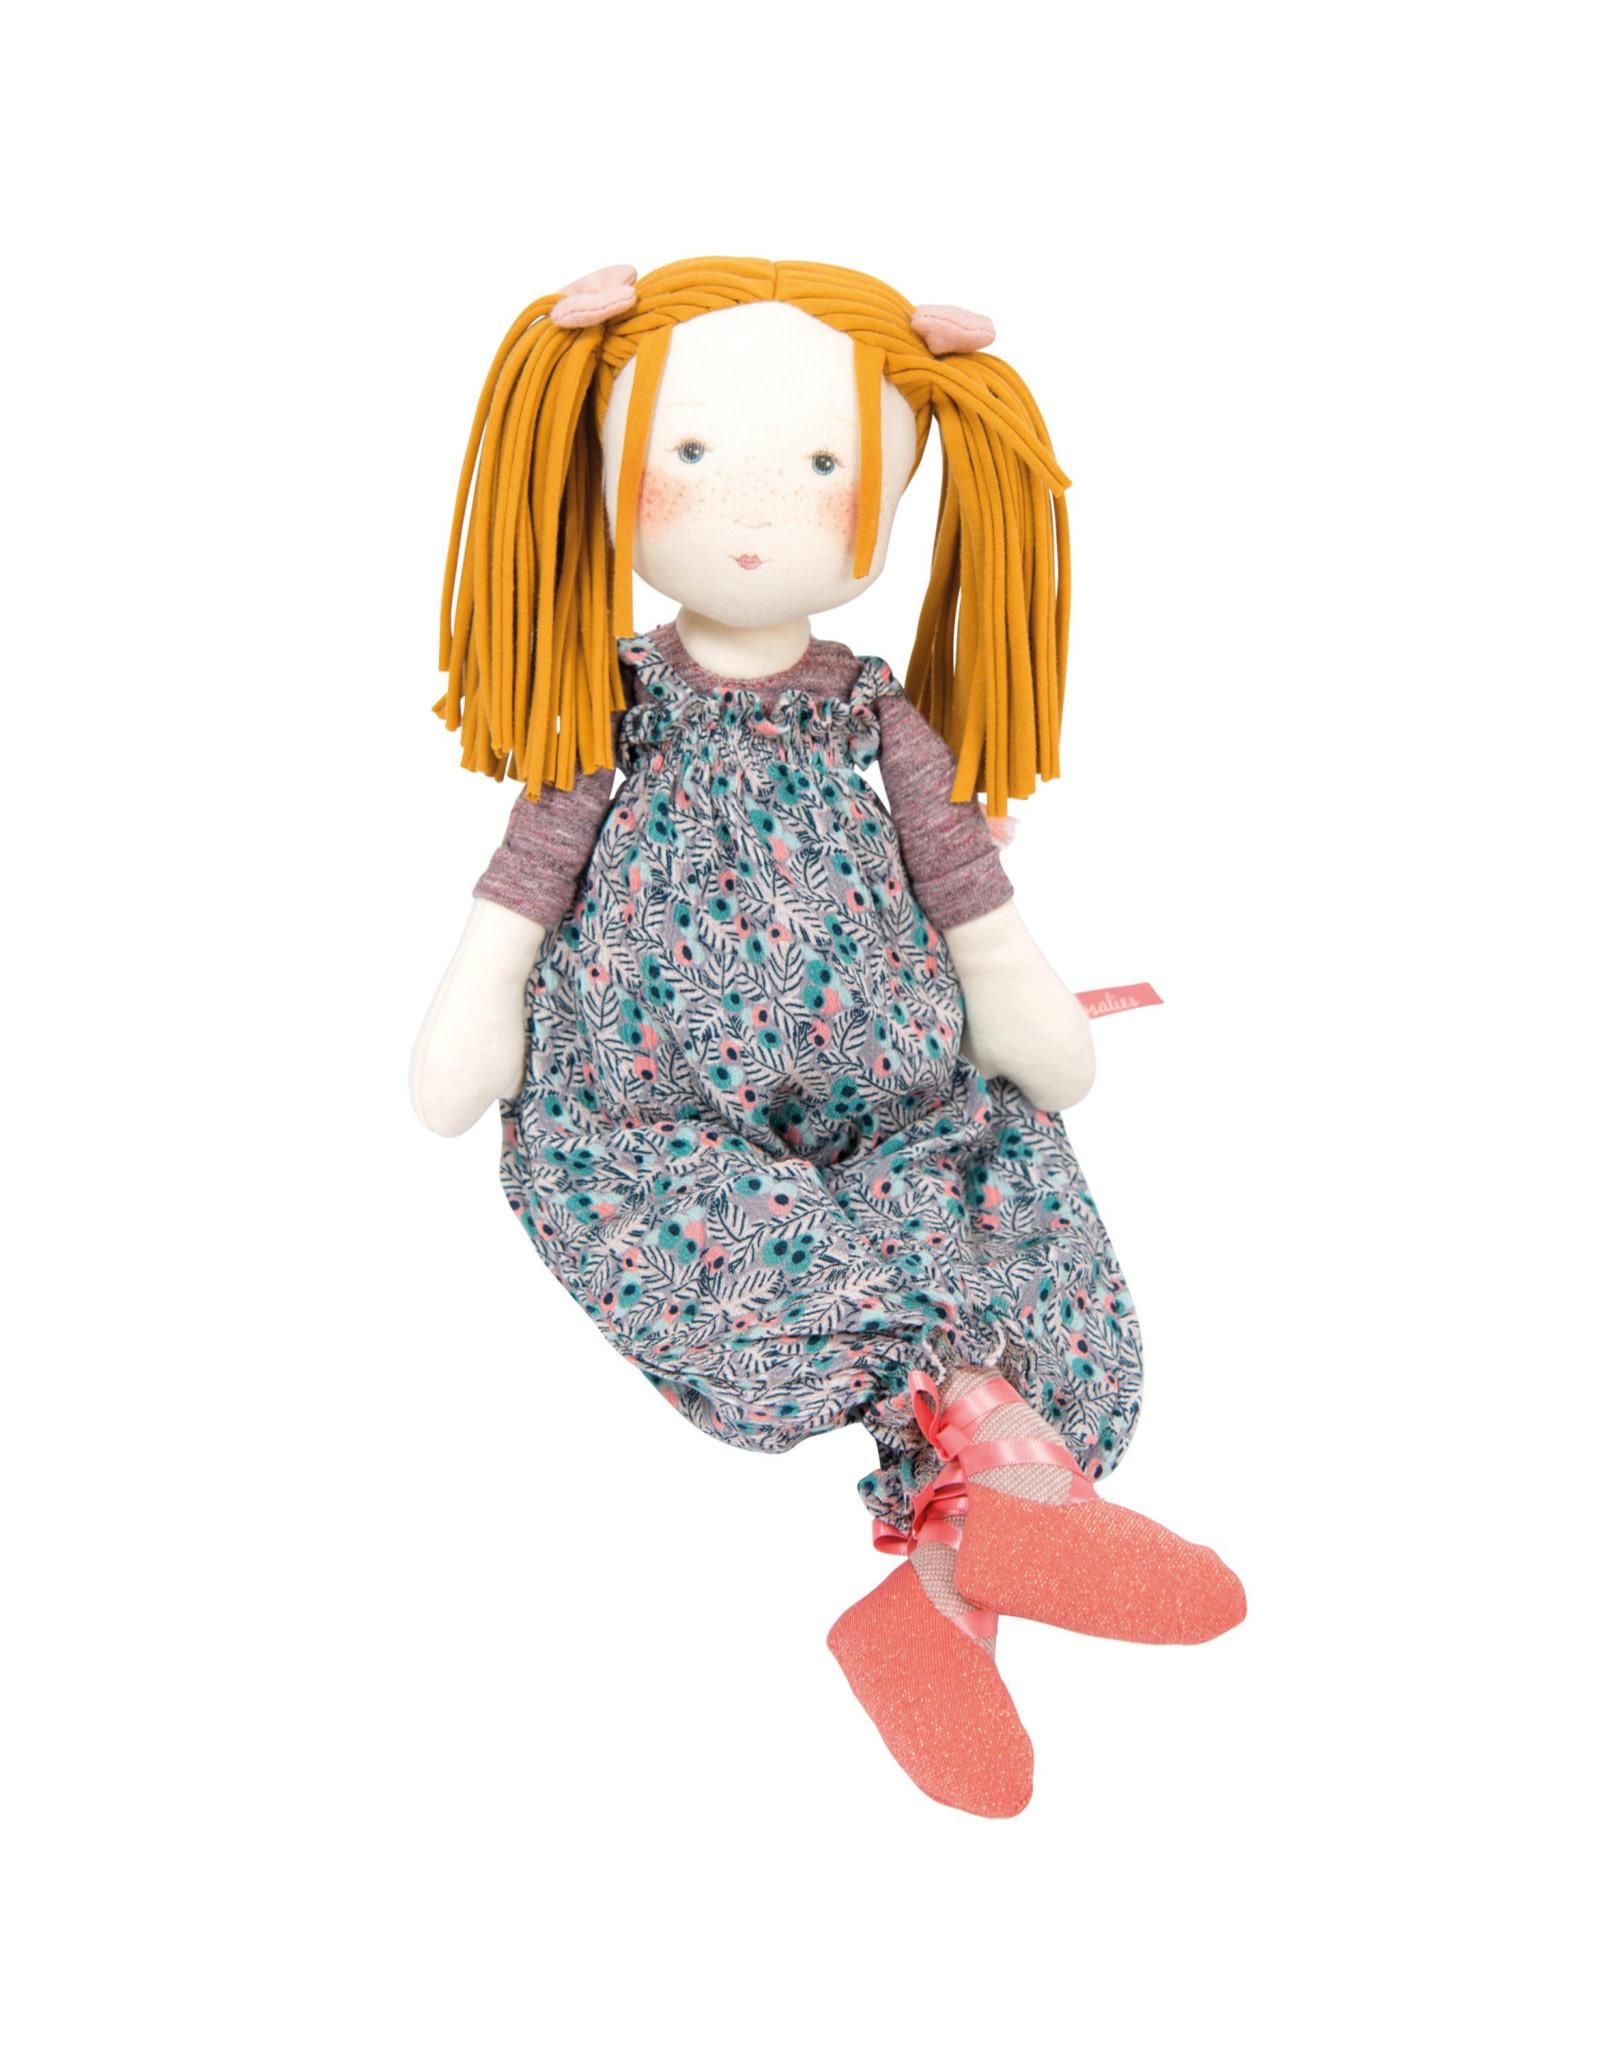 Moulin Roty Rag Doll - Violet